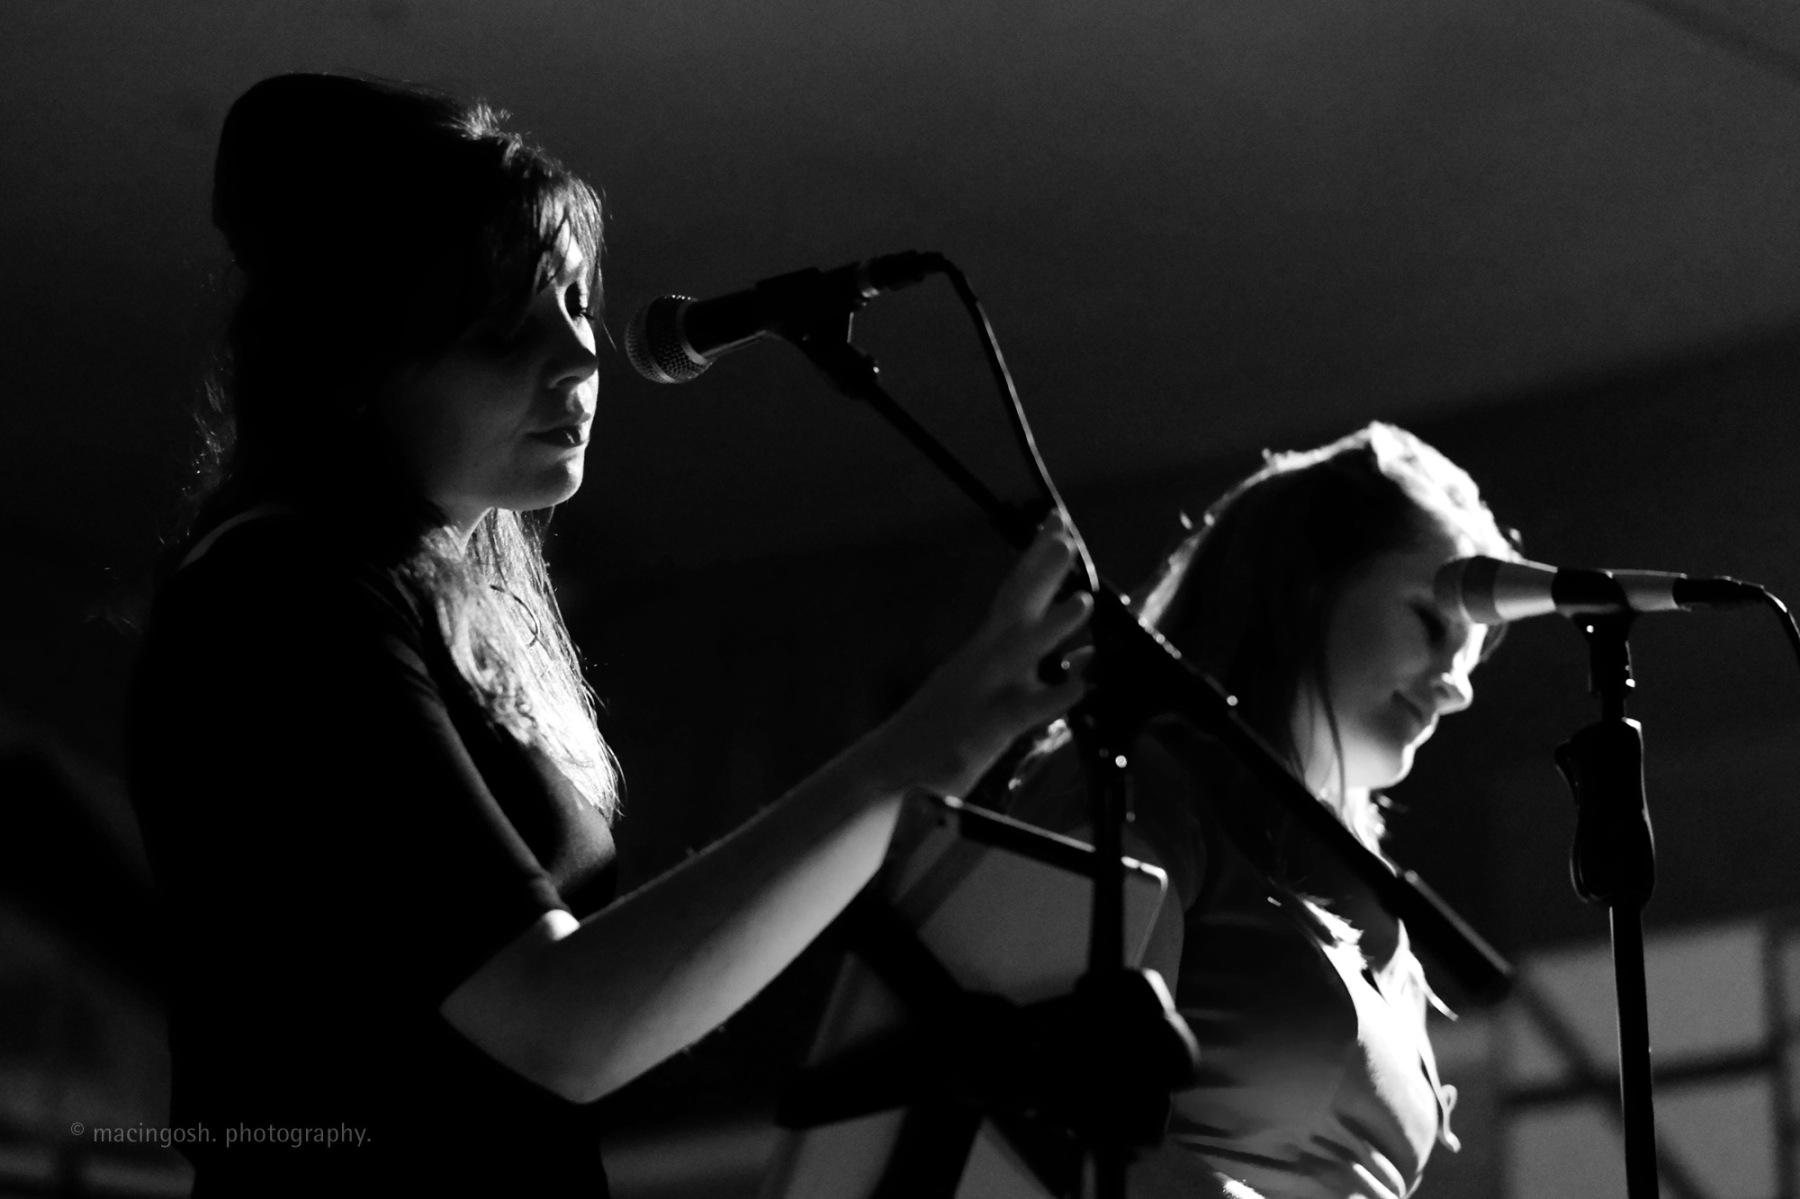 the originators, northern soul band, macingosh photography